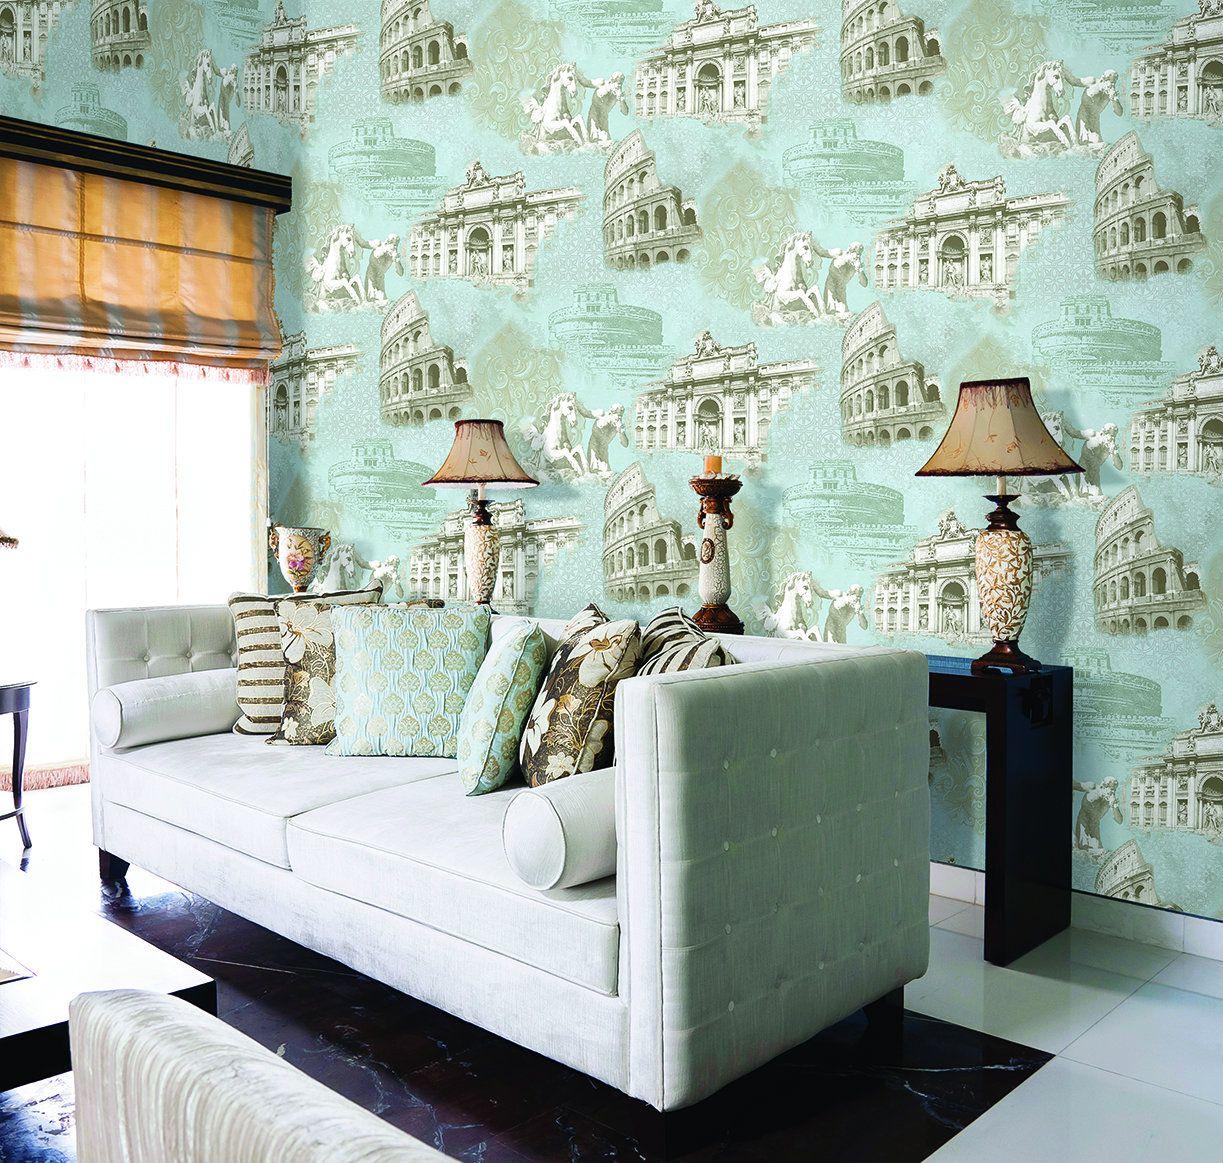 Polaris 7391 Wallpaper suppliers, Furnishings, Wallpaper